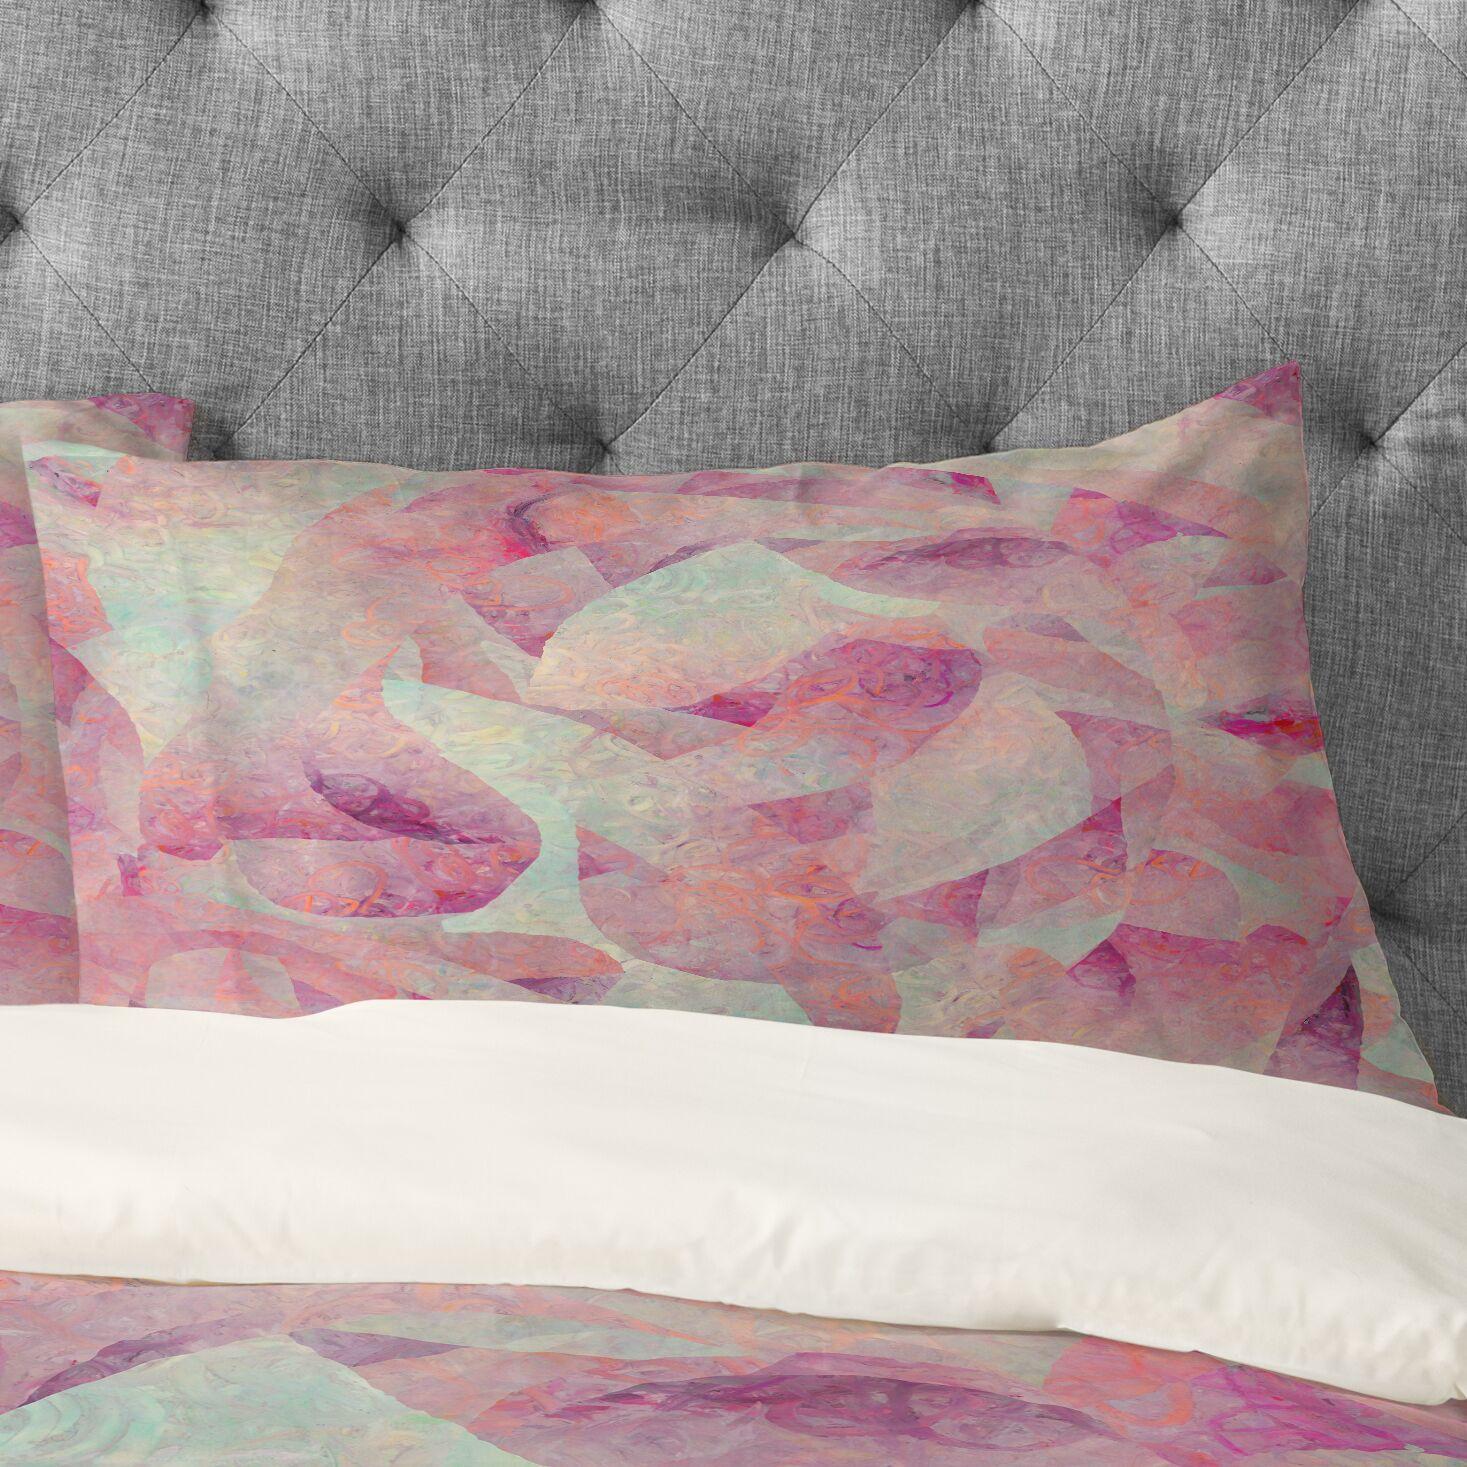 Jacqueline Maldonado Sleep to Dream Pillowcase Size: Standard